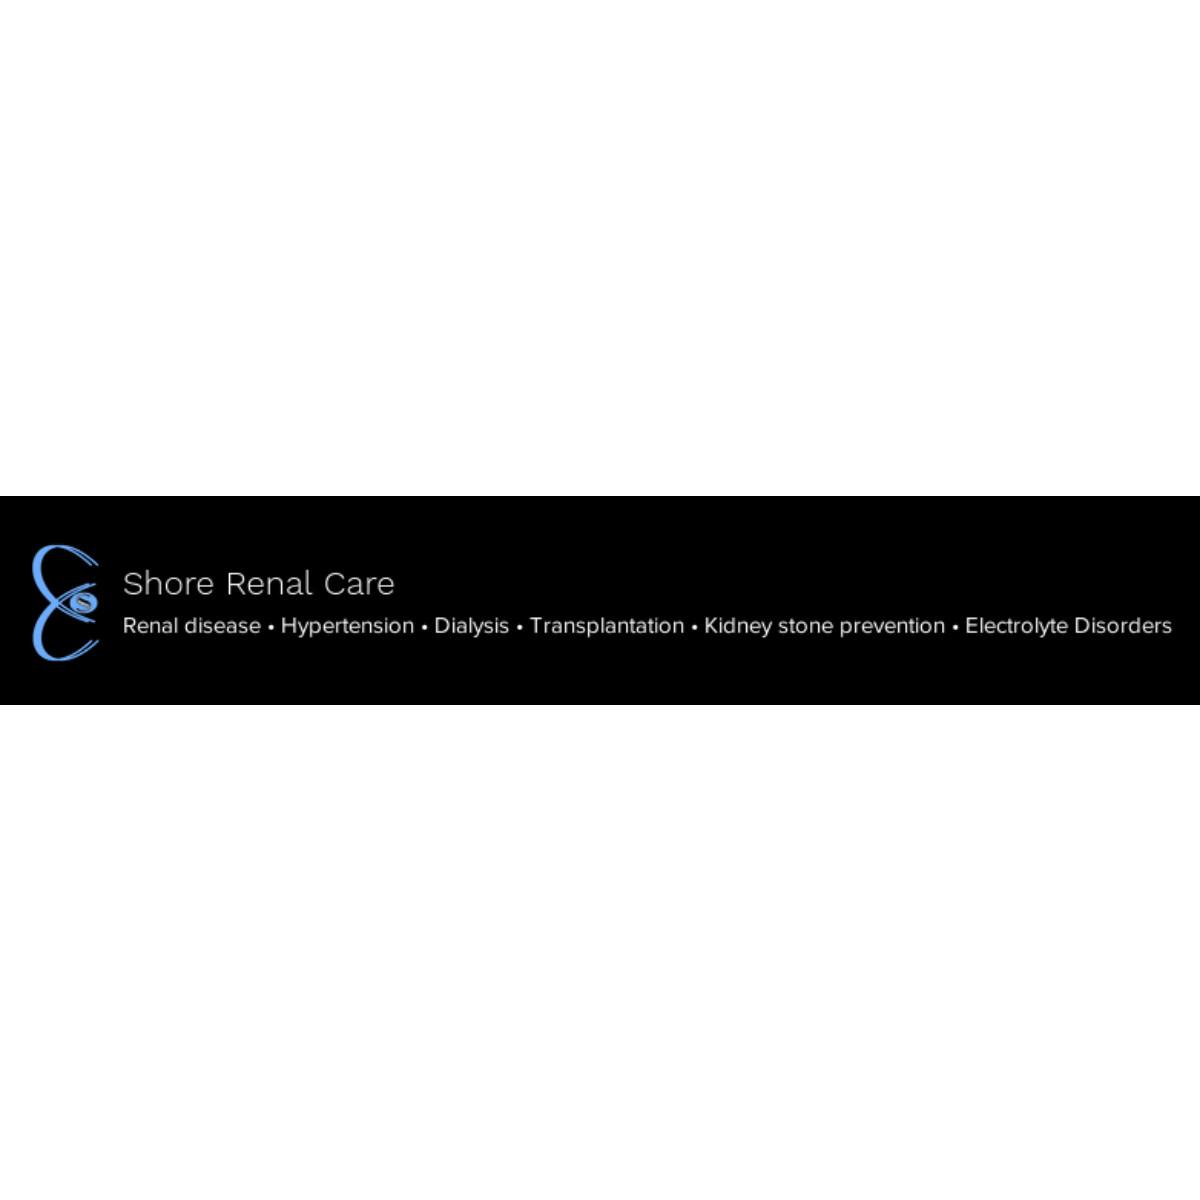 Shore Renal Care – Lincroft